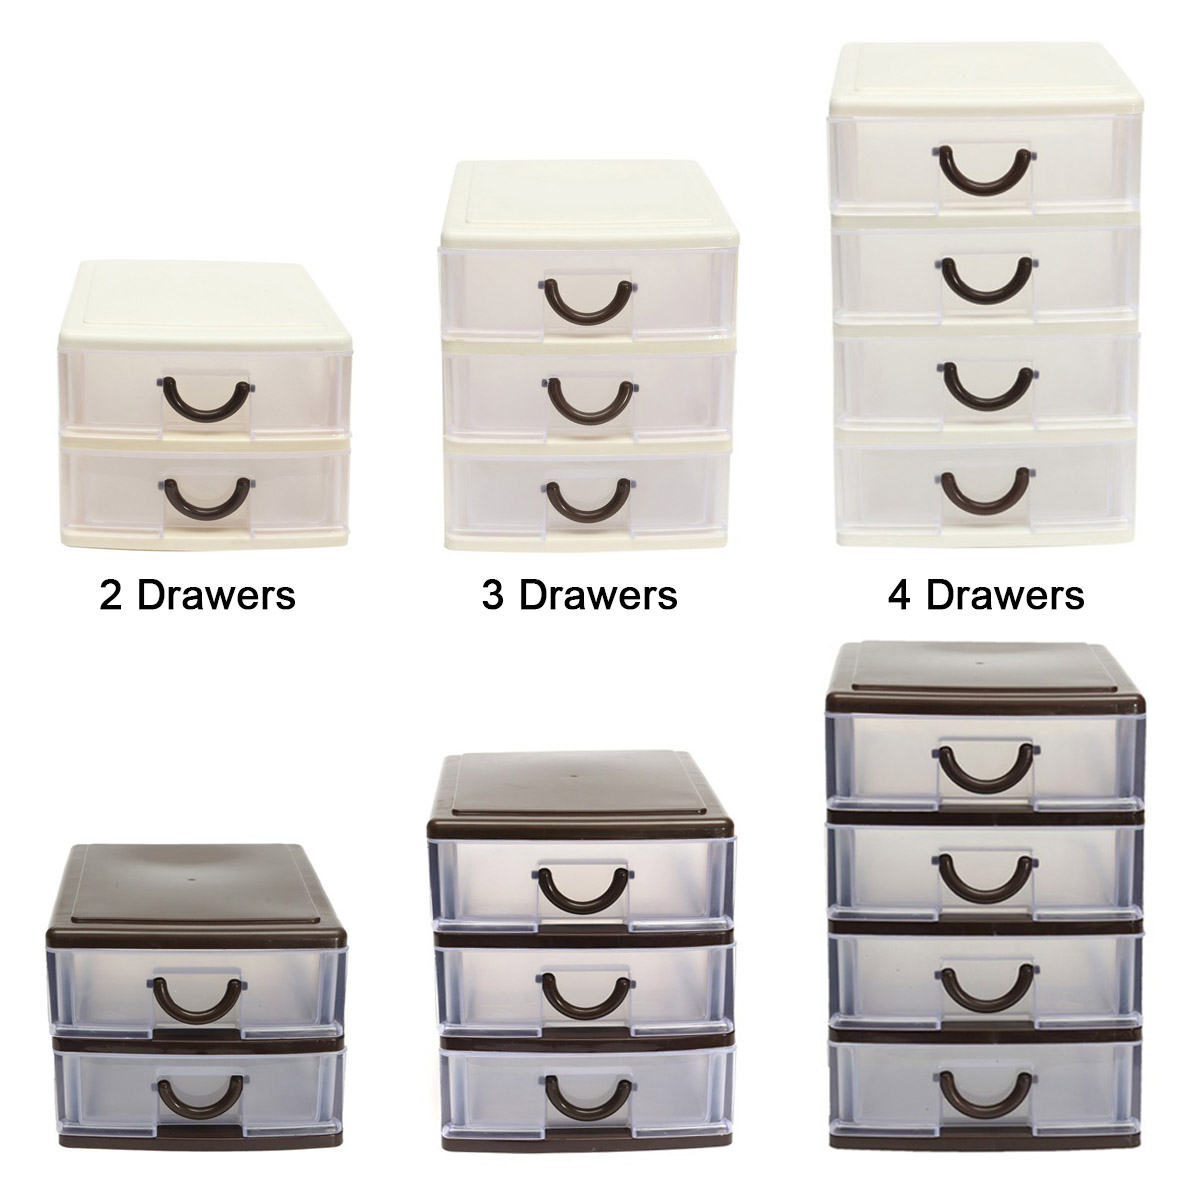 Storage-Box Drawer Cosmetic Office-Table Desktop Plastic Debris Durable Holder Hot Hogard